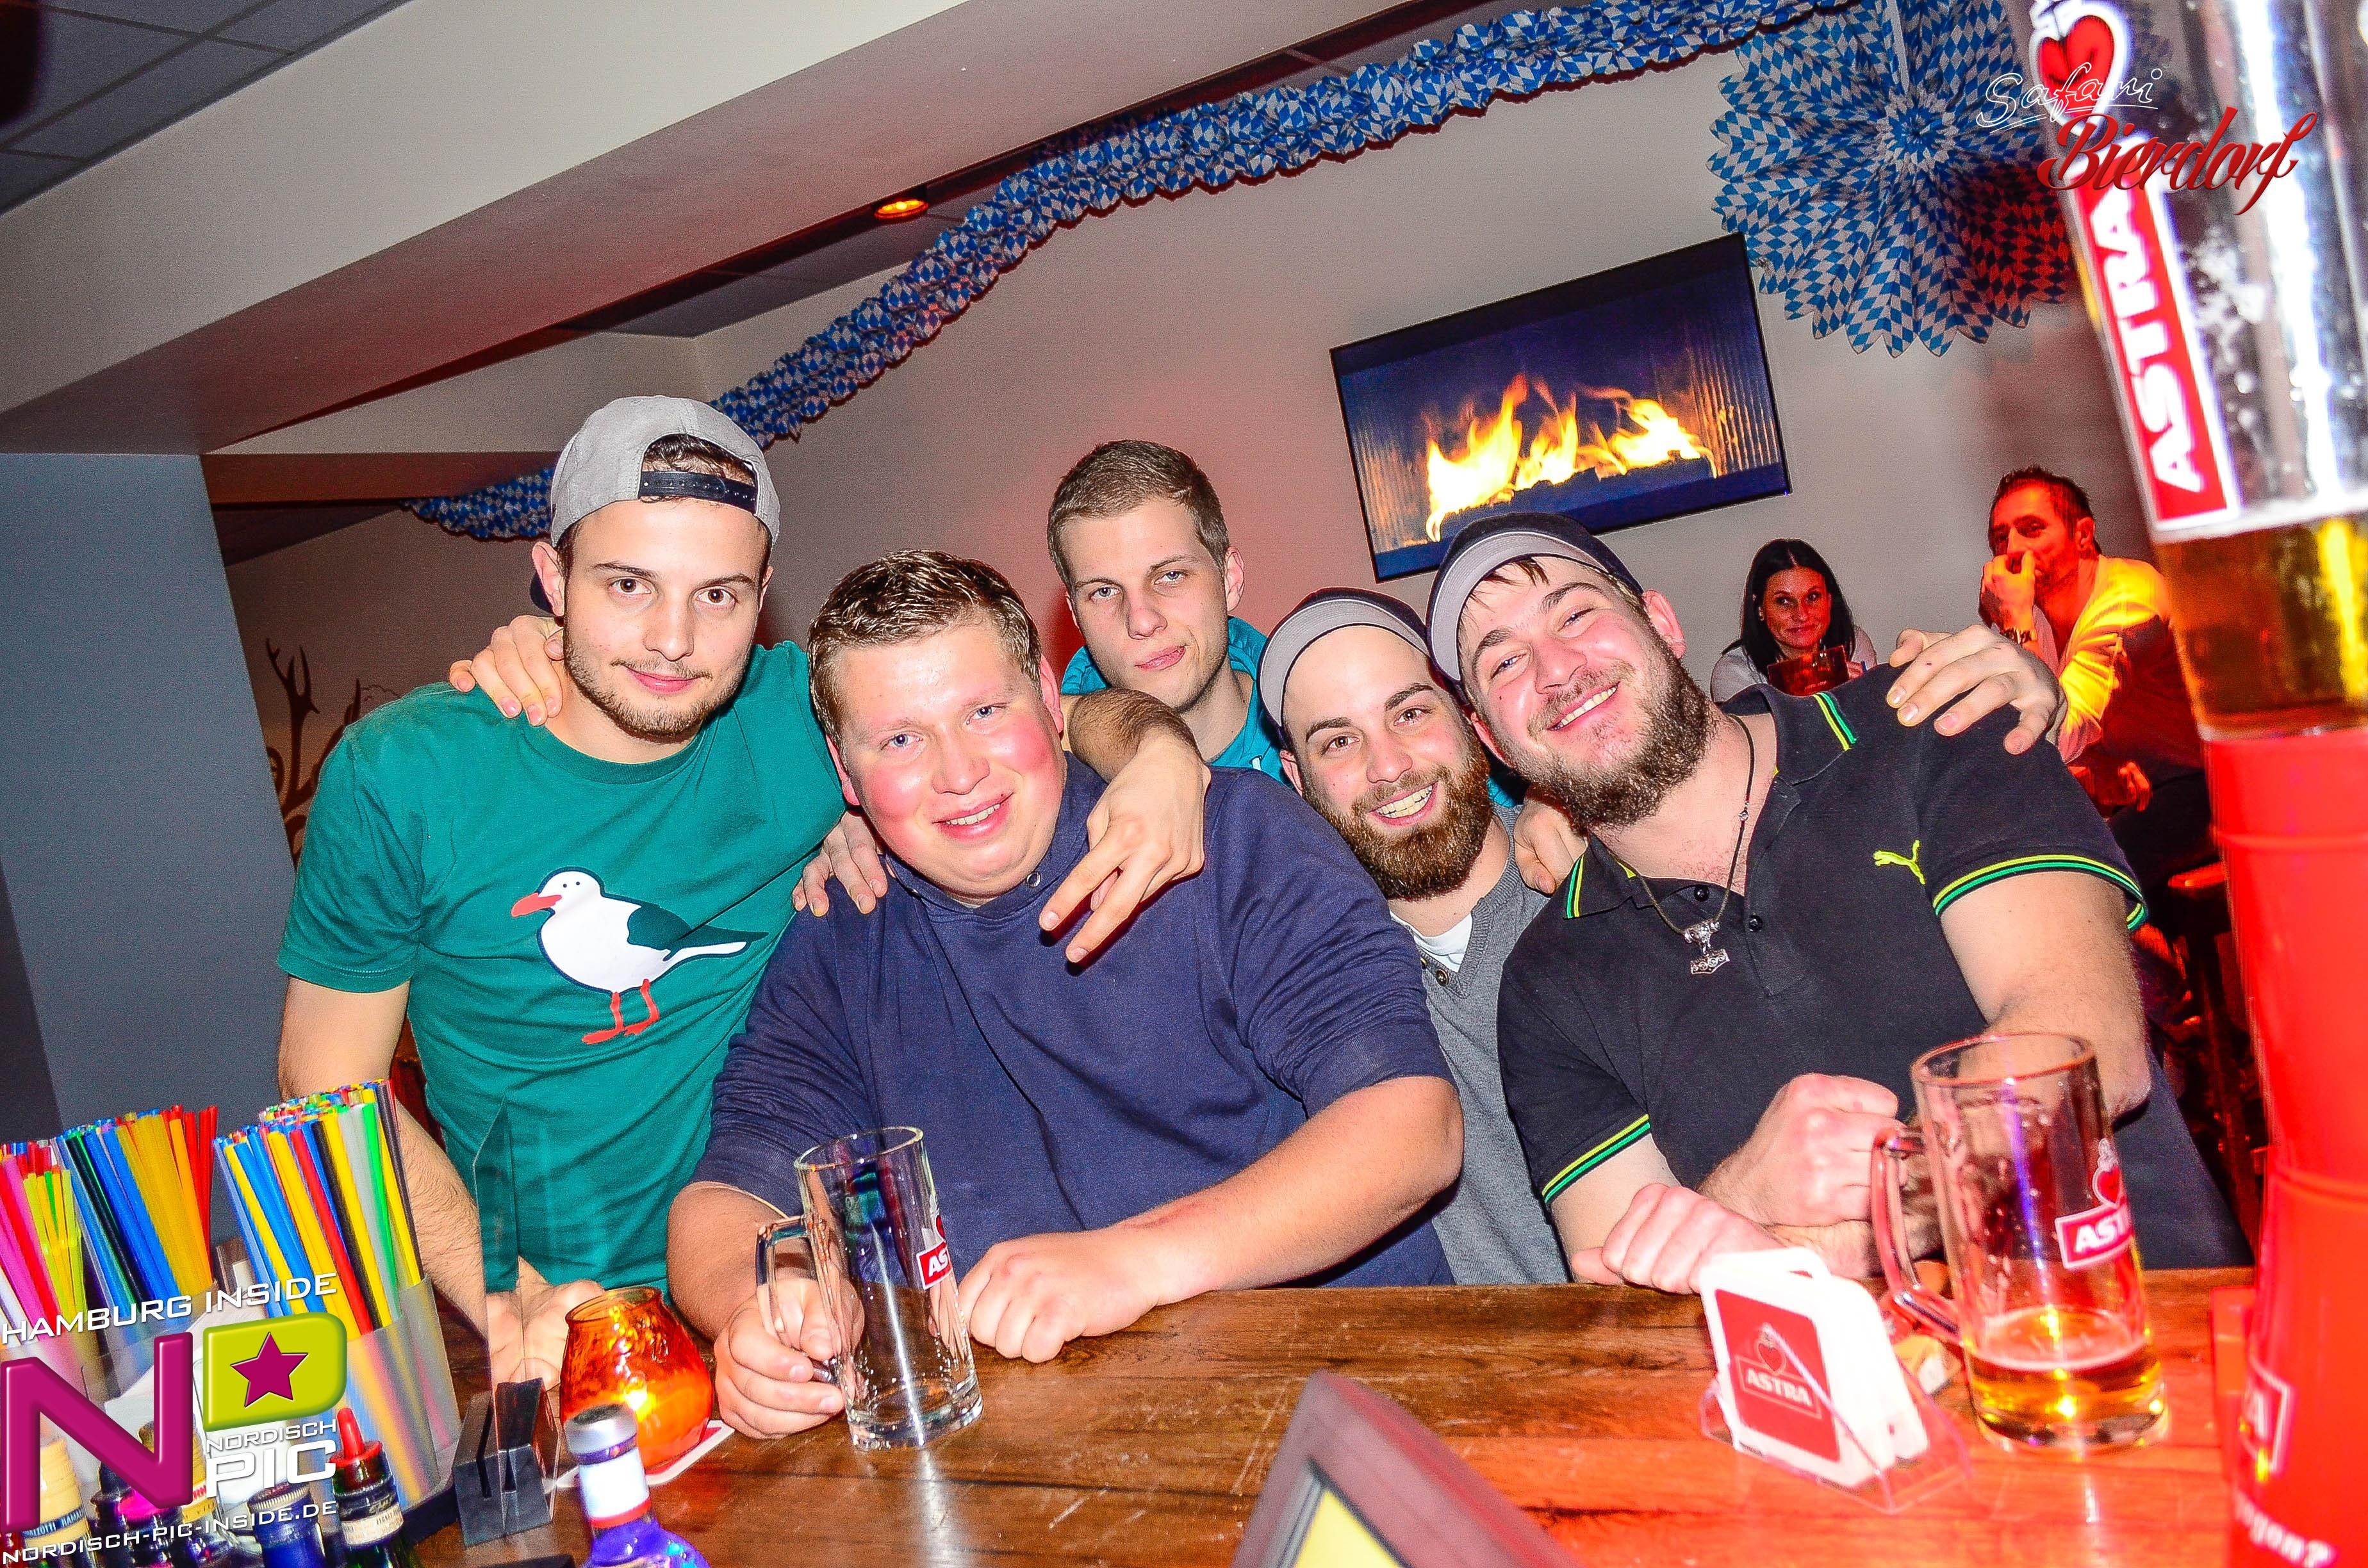 Safari_Bierdorf_Nordisch_Pic_08012016-2